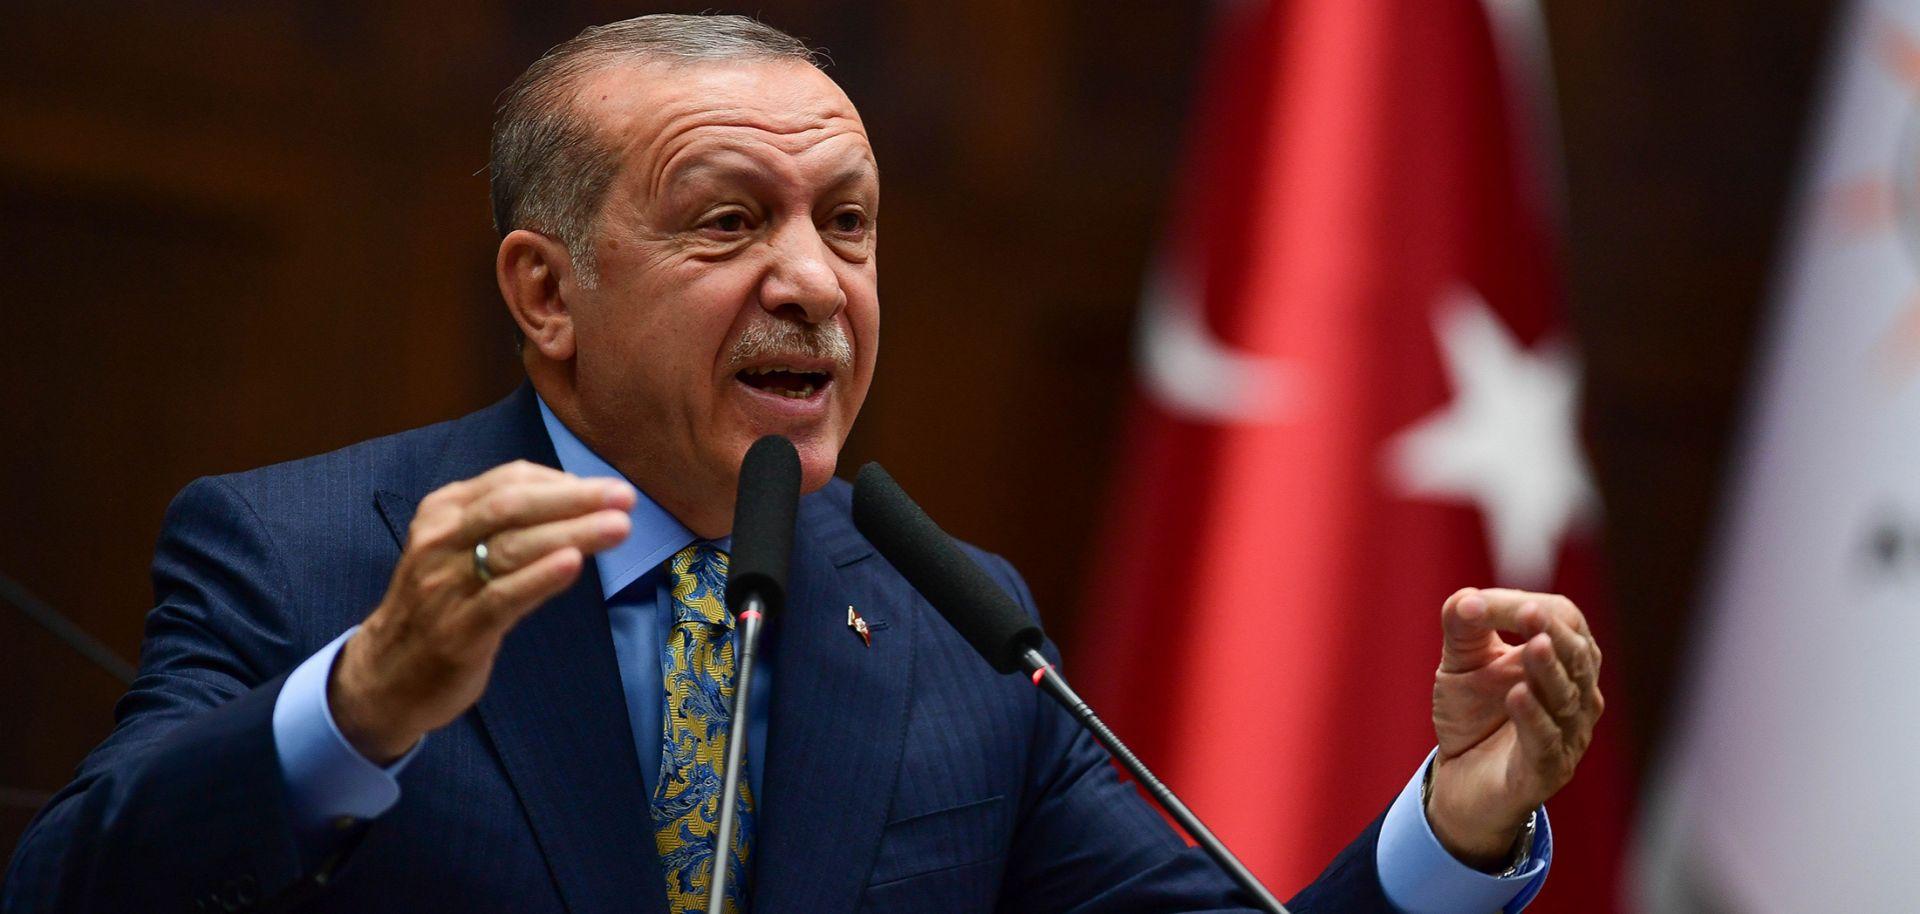 President Recep Tayyip Erdogan speaks about the slaying of Saudi journalist Jamal Khashoggi during a weekly parliamentary address on Oct. 23 in Ankara.